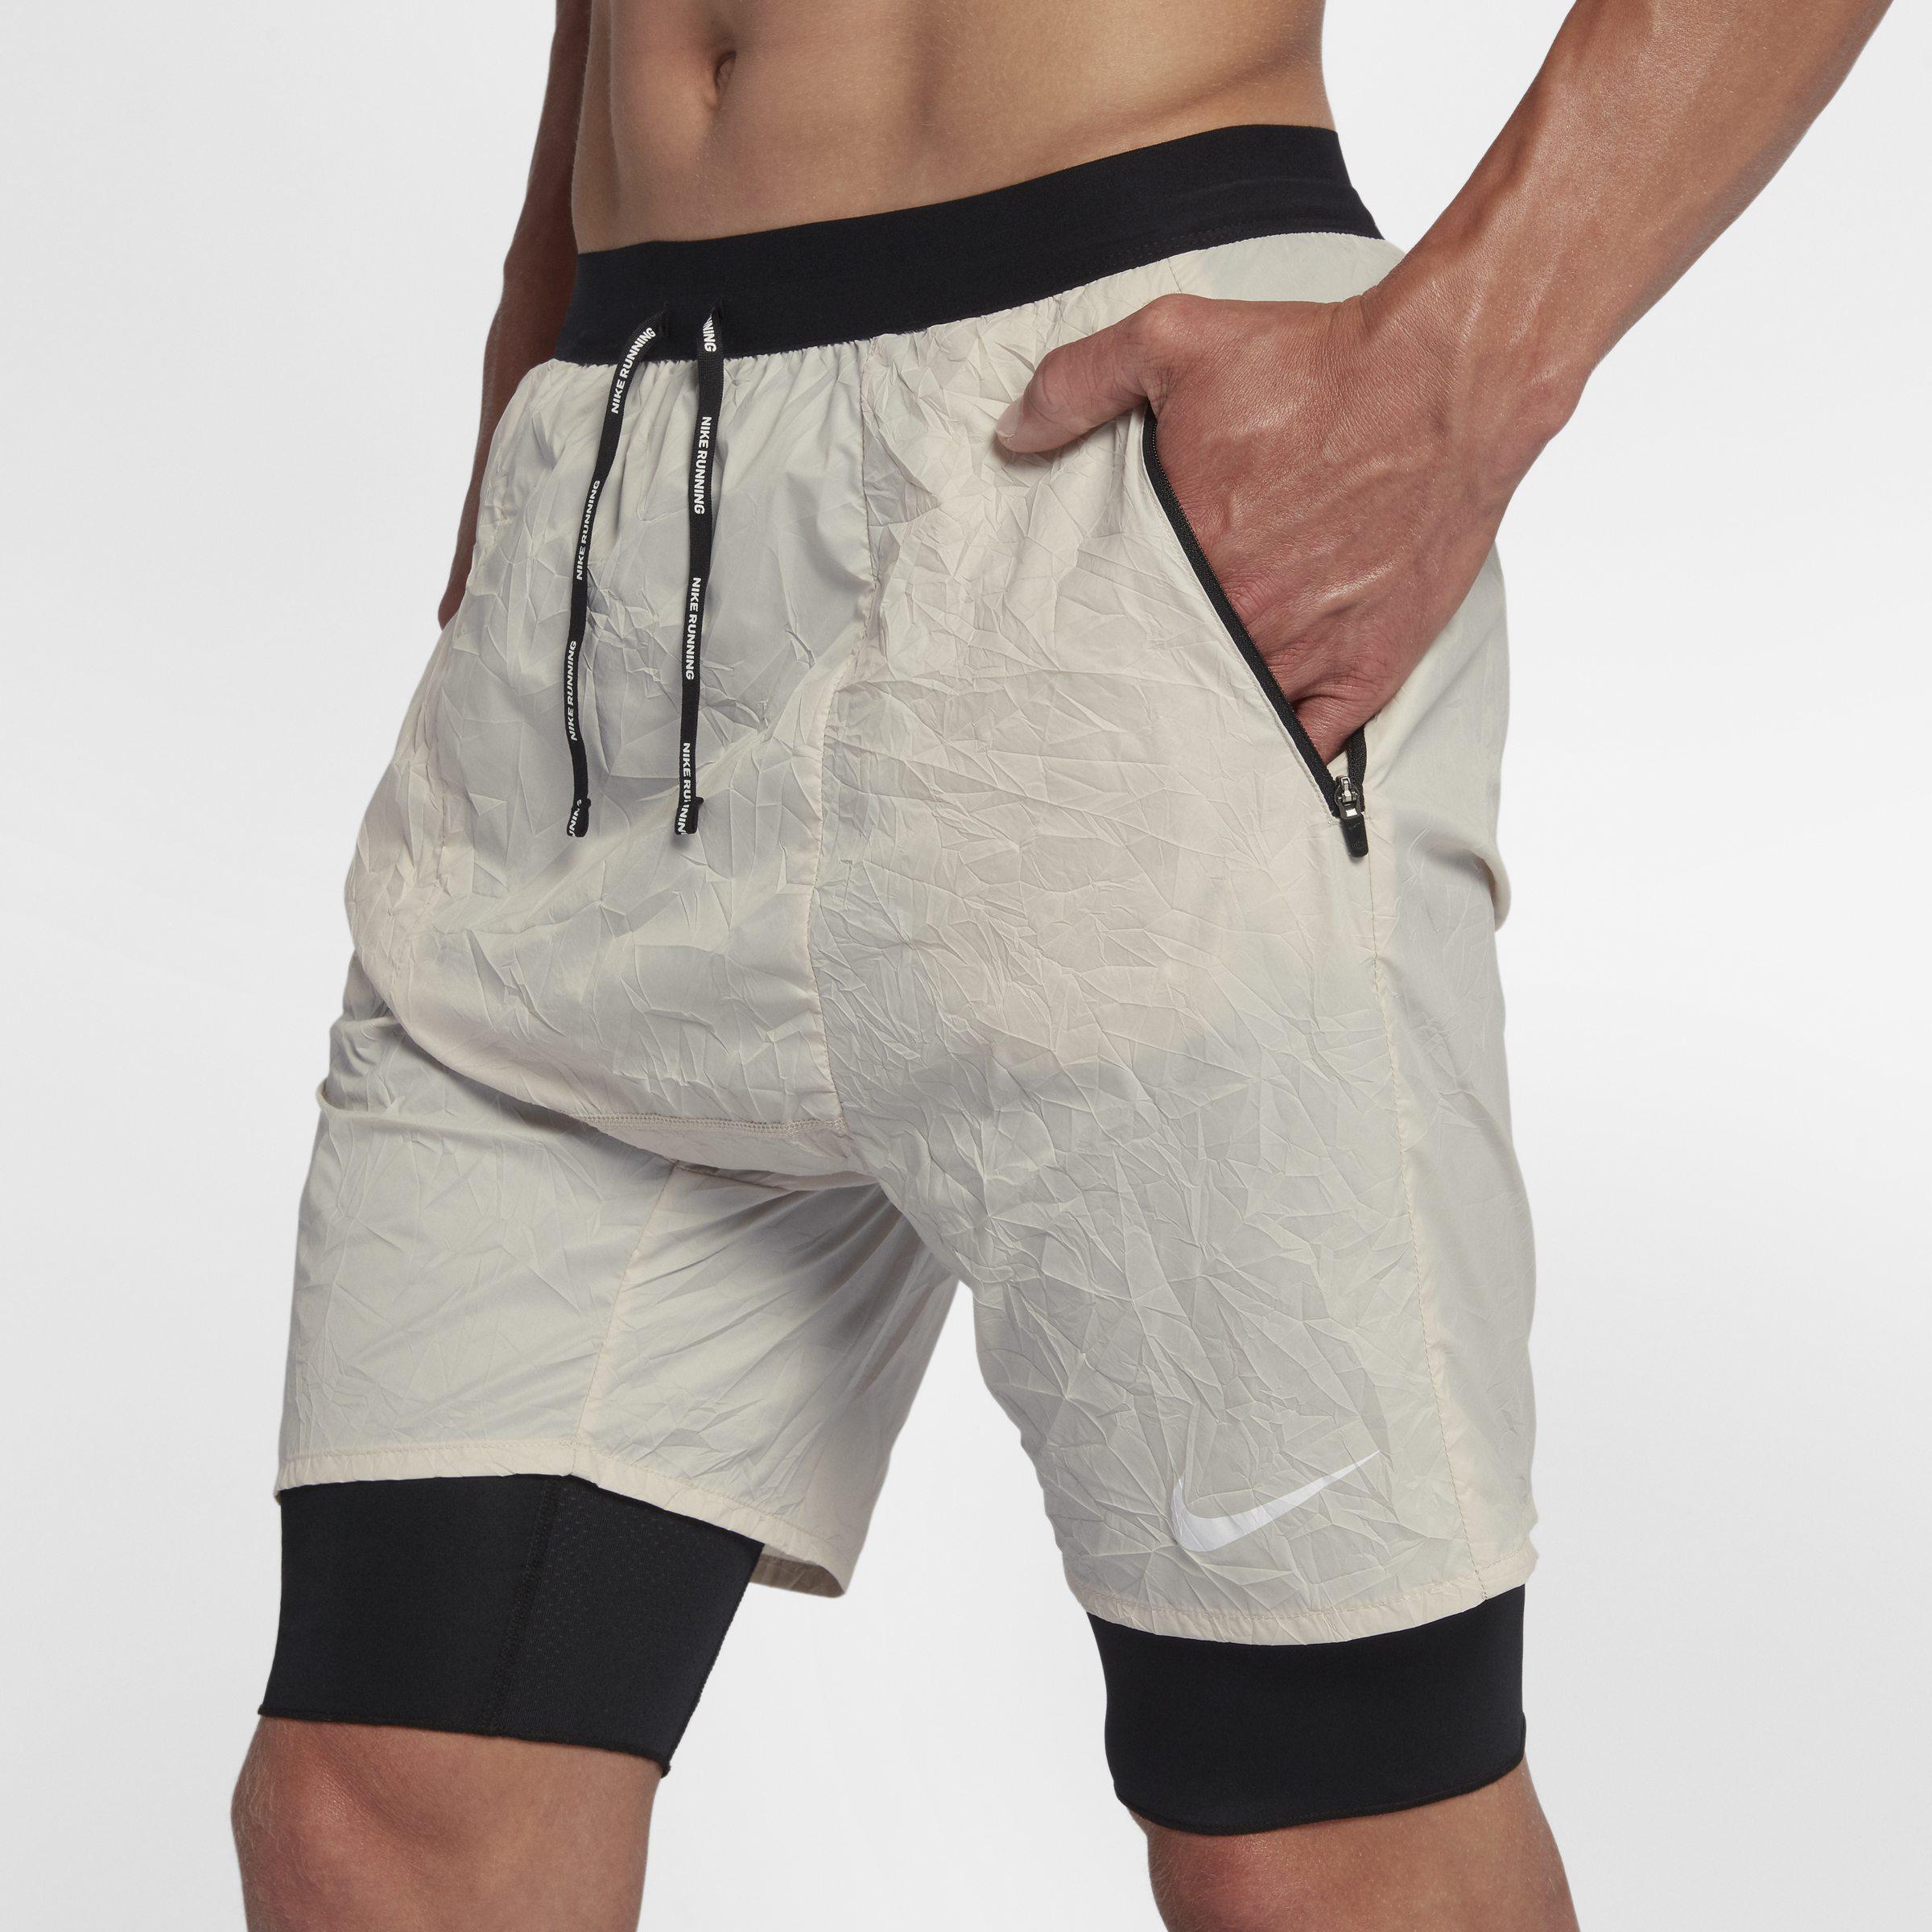 64dd16280e8e Nike Flex Run Division Stride Elevate 2-in-1 Running Shorts in Gray ...